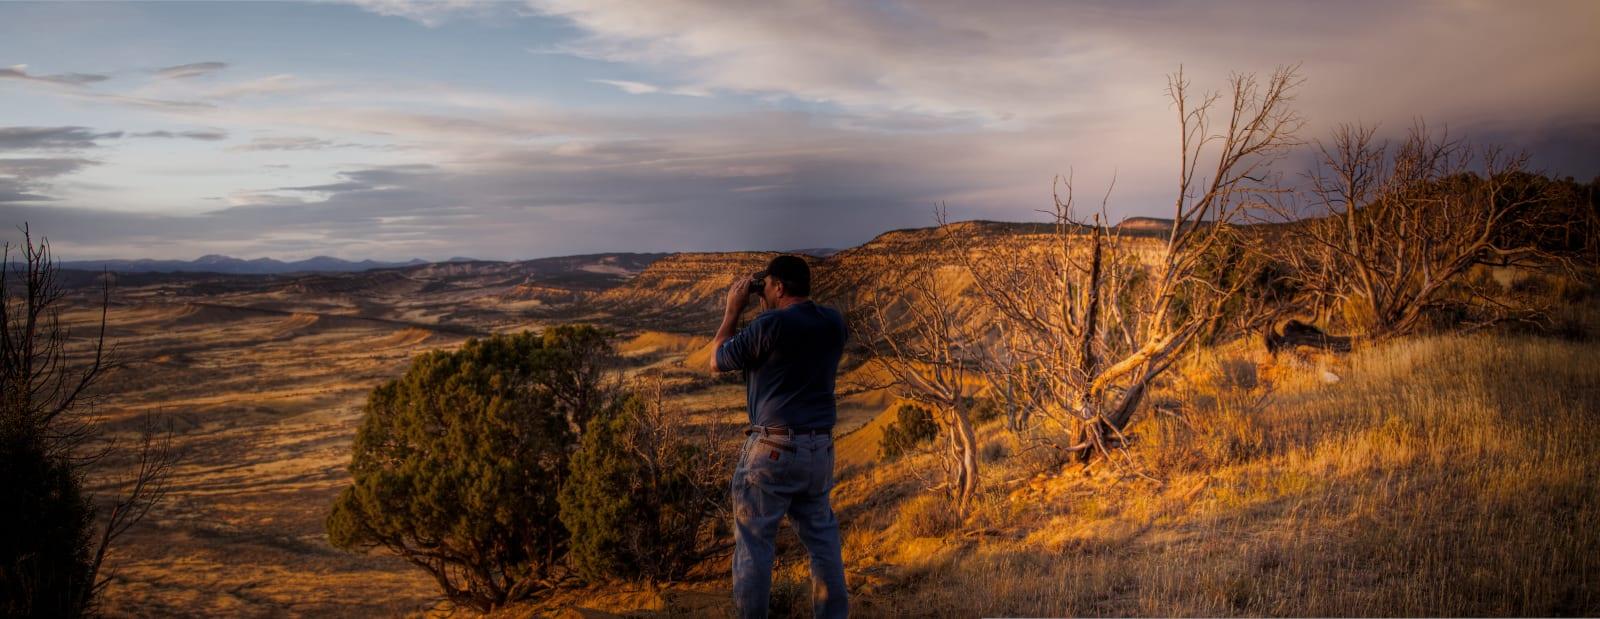 Big Game Hunting Scouting Pinyon Overlook Meeker Colorado